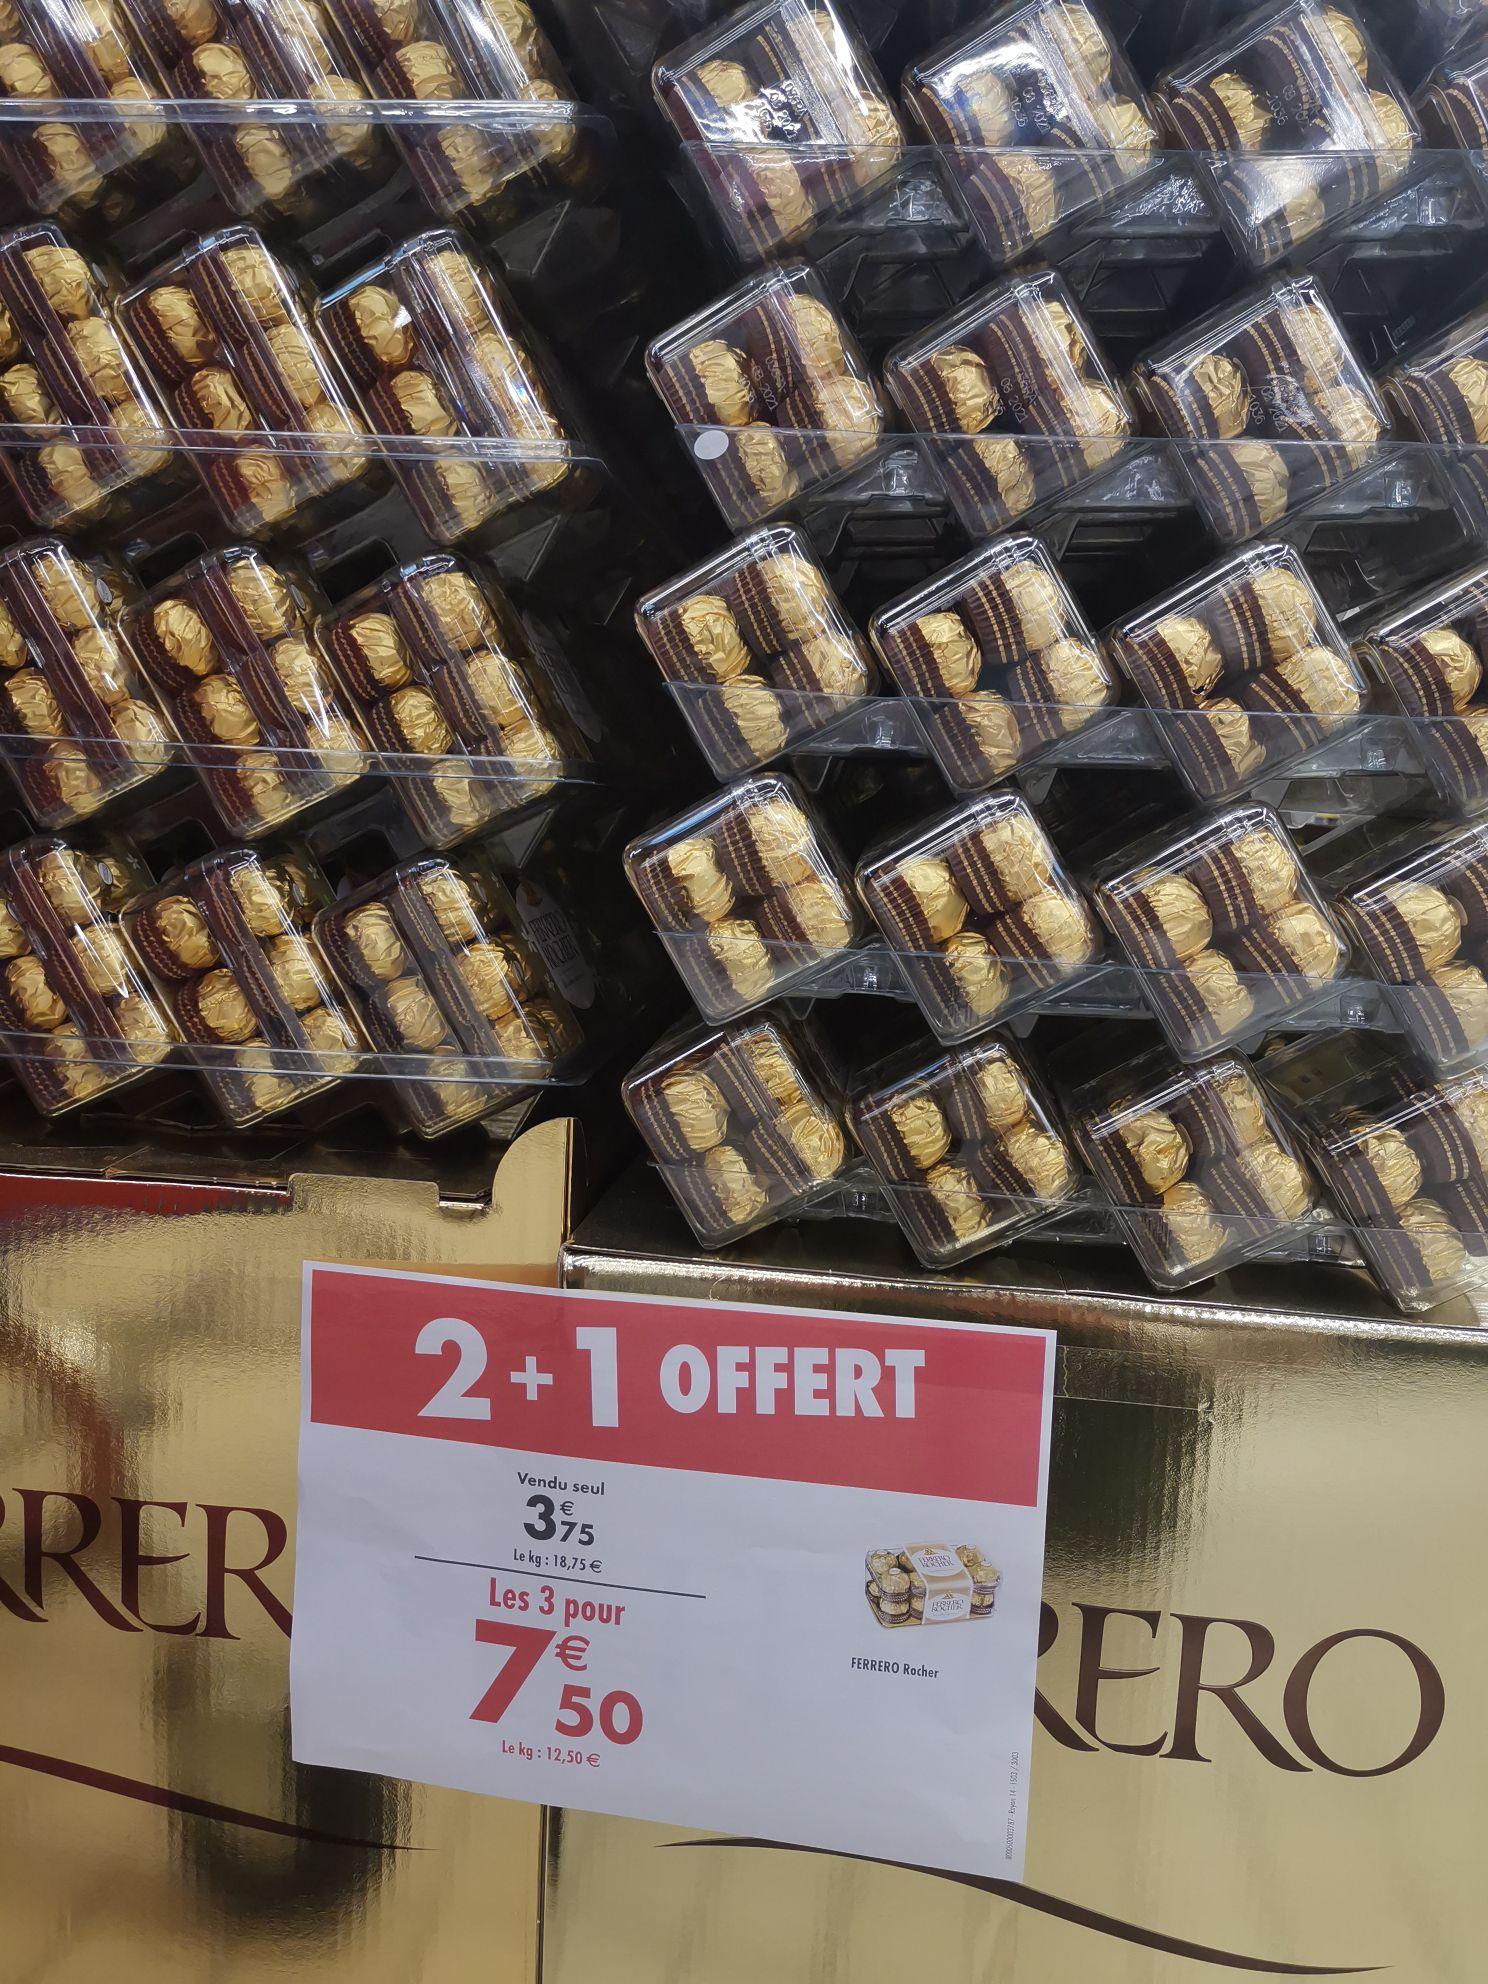 Lot de 3 boîtes de 16 chocolats Ferrero Rocher - Aubervilliers / Montreuil (93)